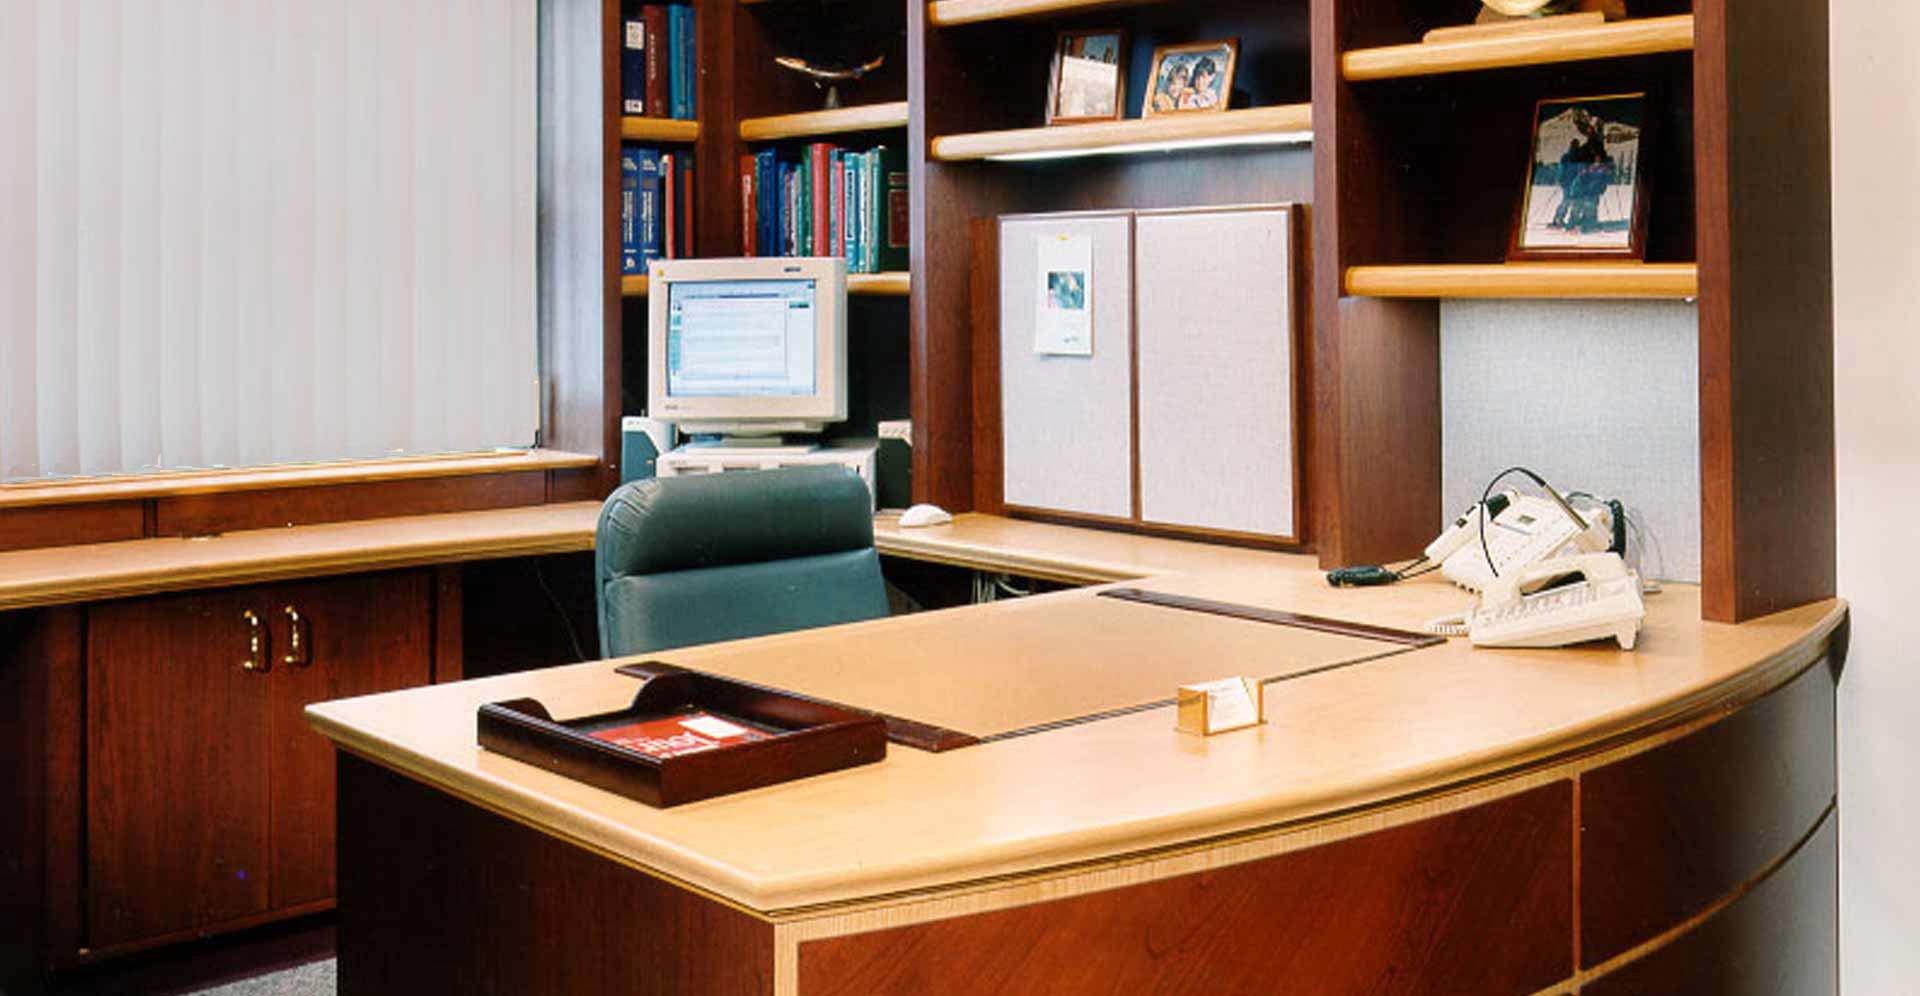 HSR Physician's Office